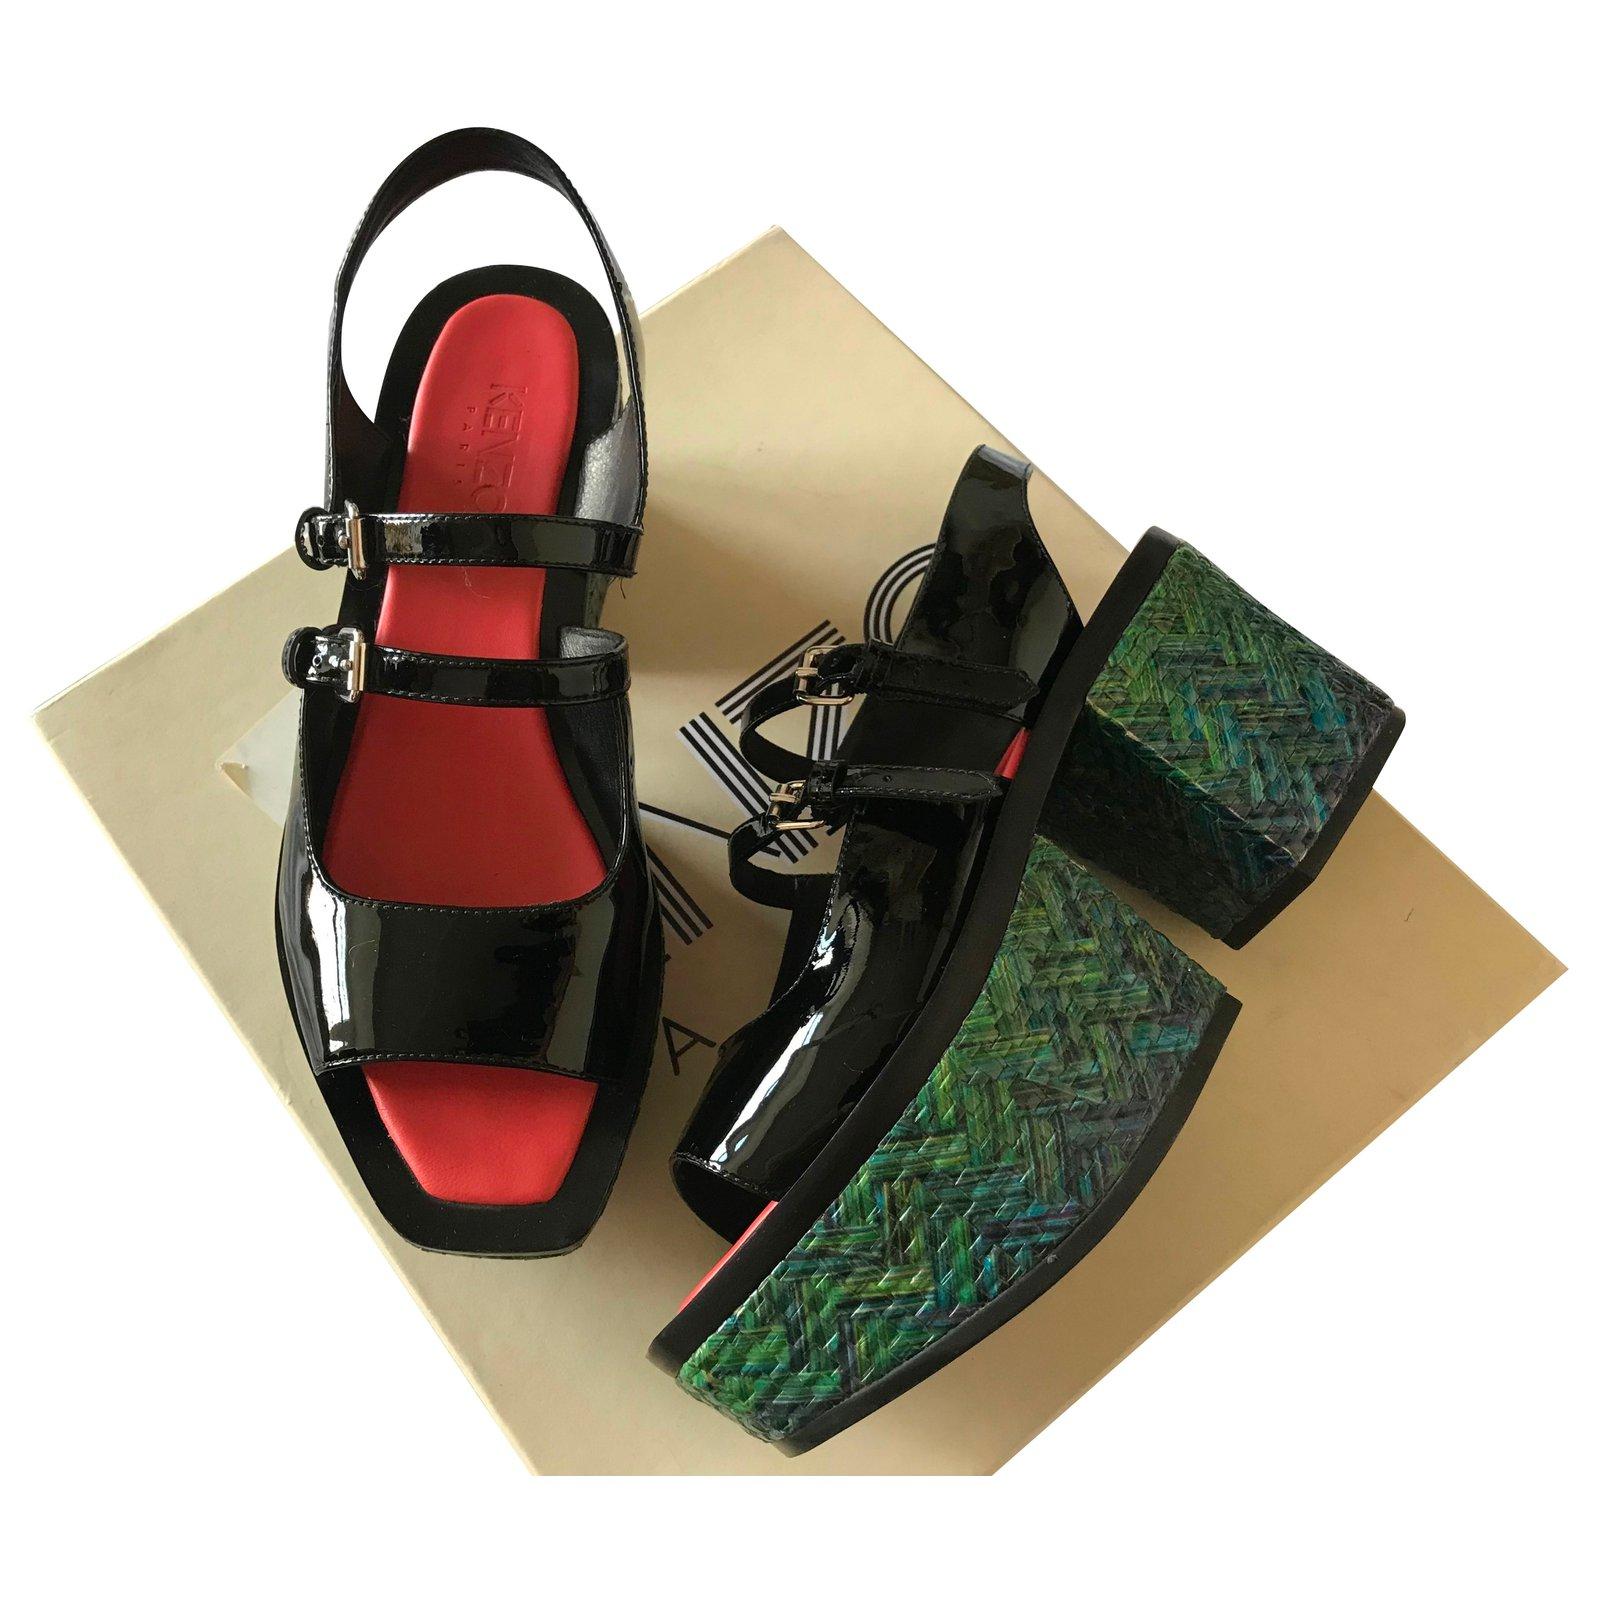 bf51c1f71a6e Kenzo Platform Sandal Sandals Patent leather Black ref.79009 - Joli ...